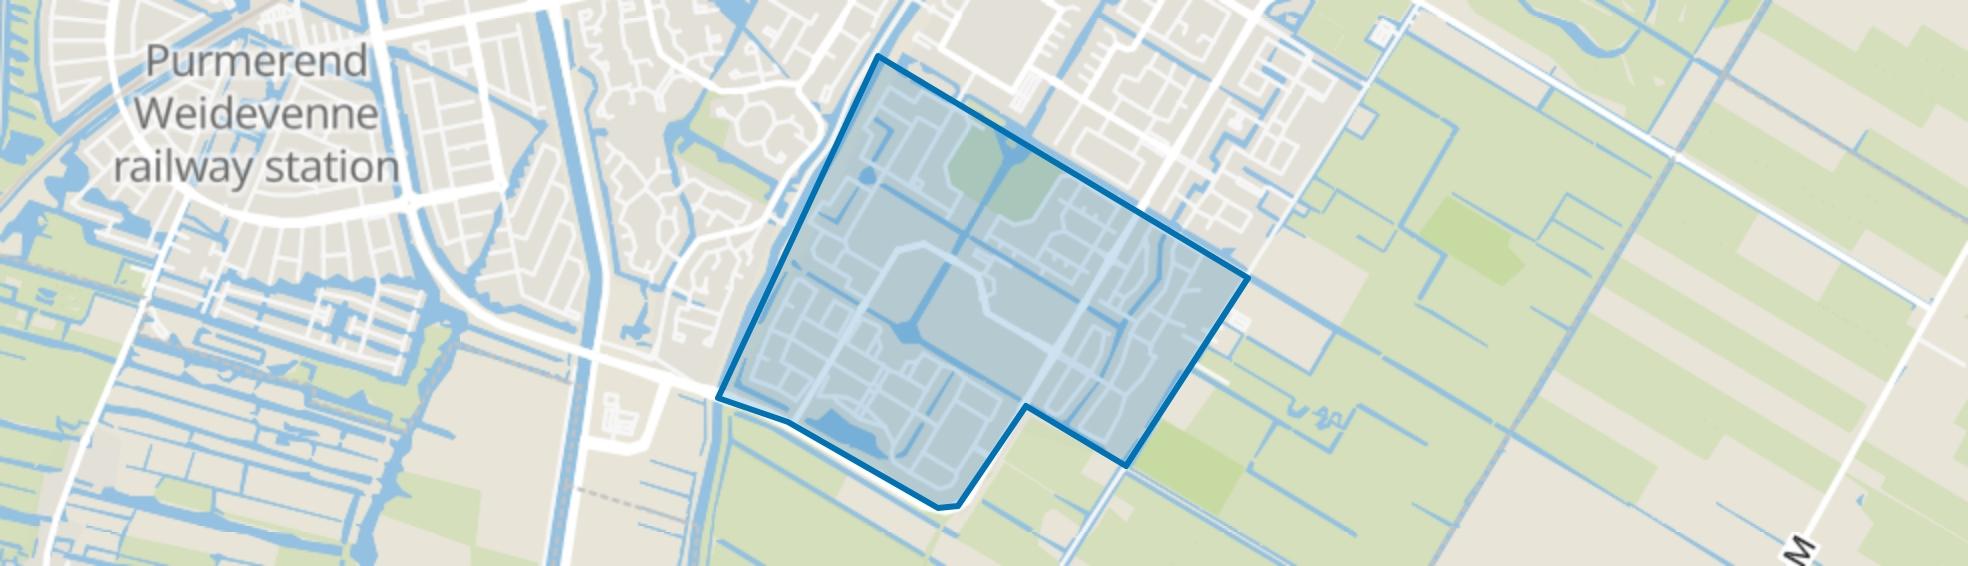 Purmer-Zuid/Zuid, Purmerend map